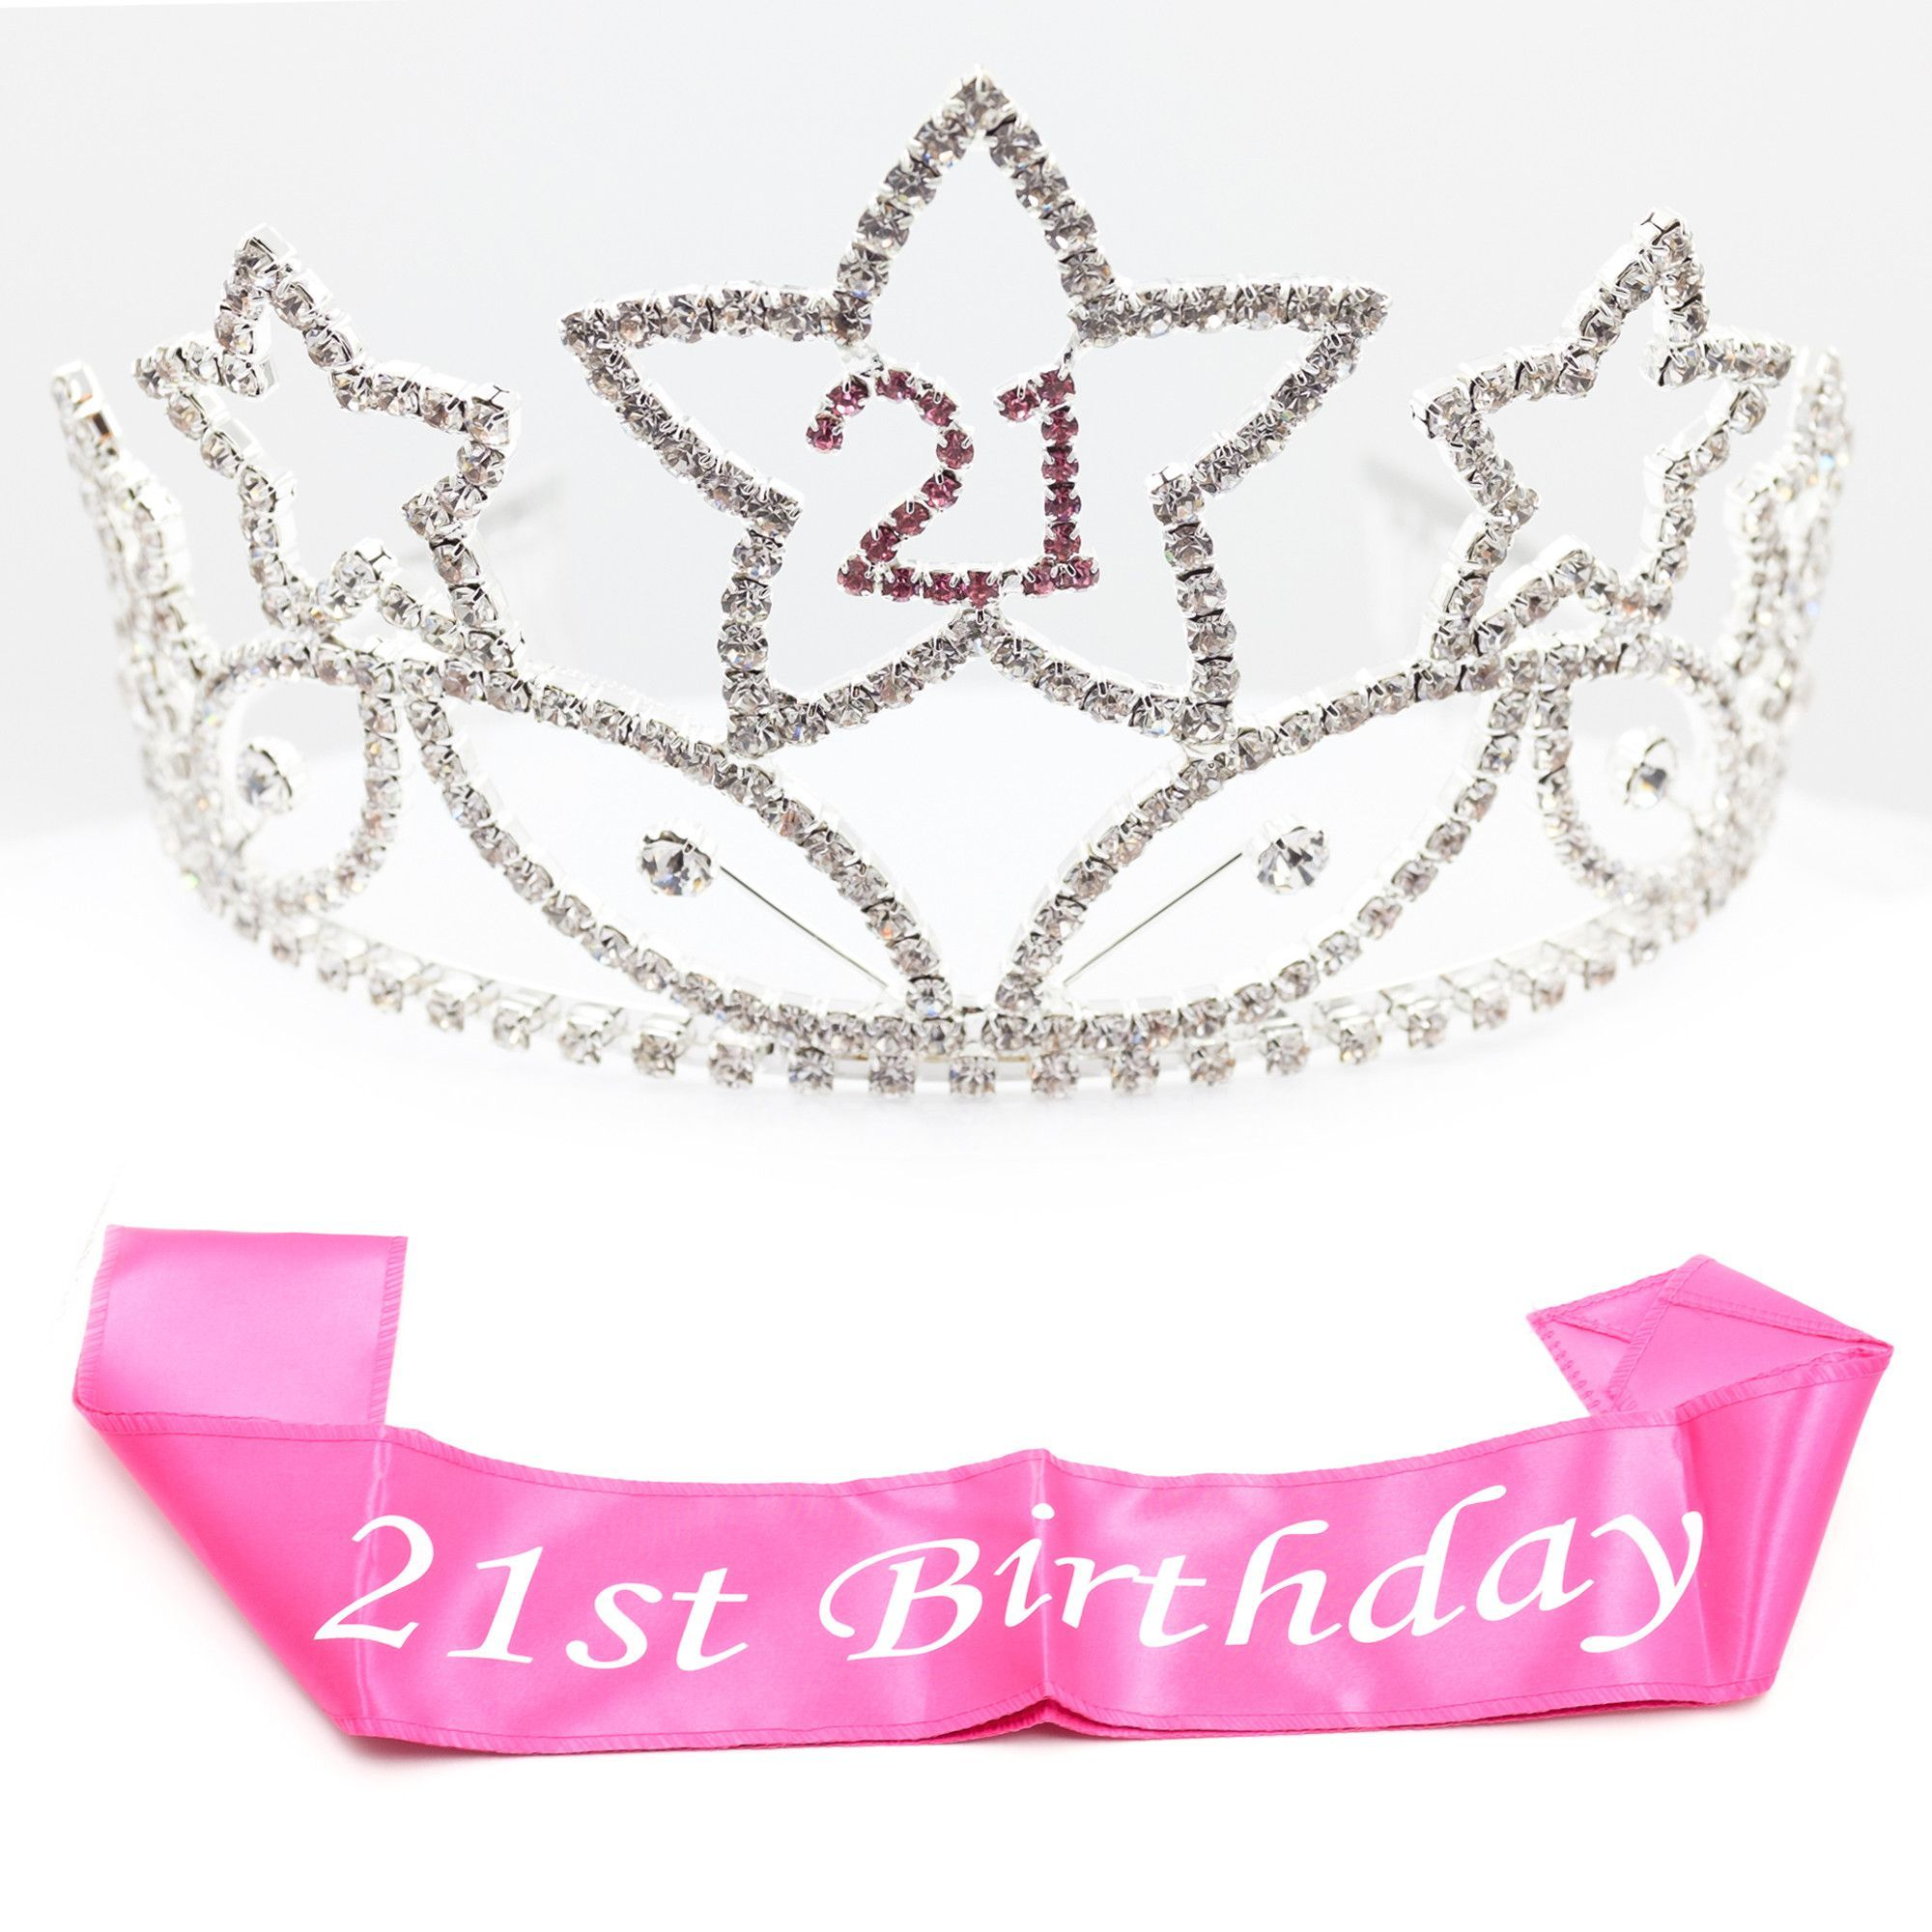 21st Birthday Tiara And Sash Twenty Birthday Party In